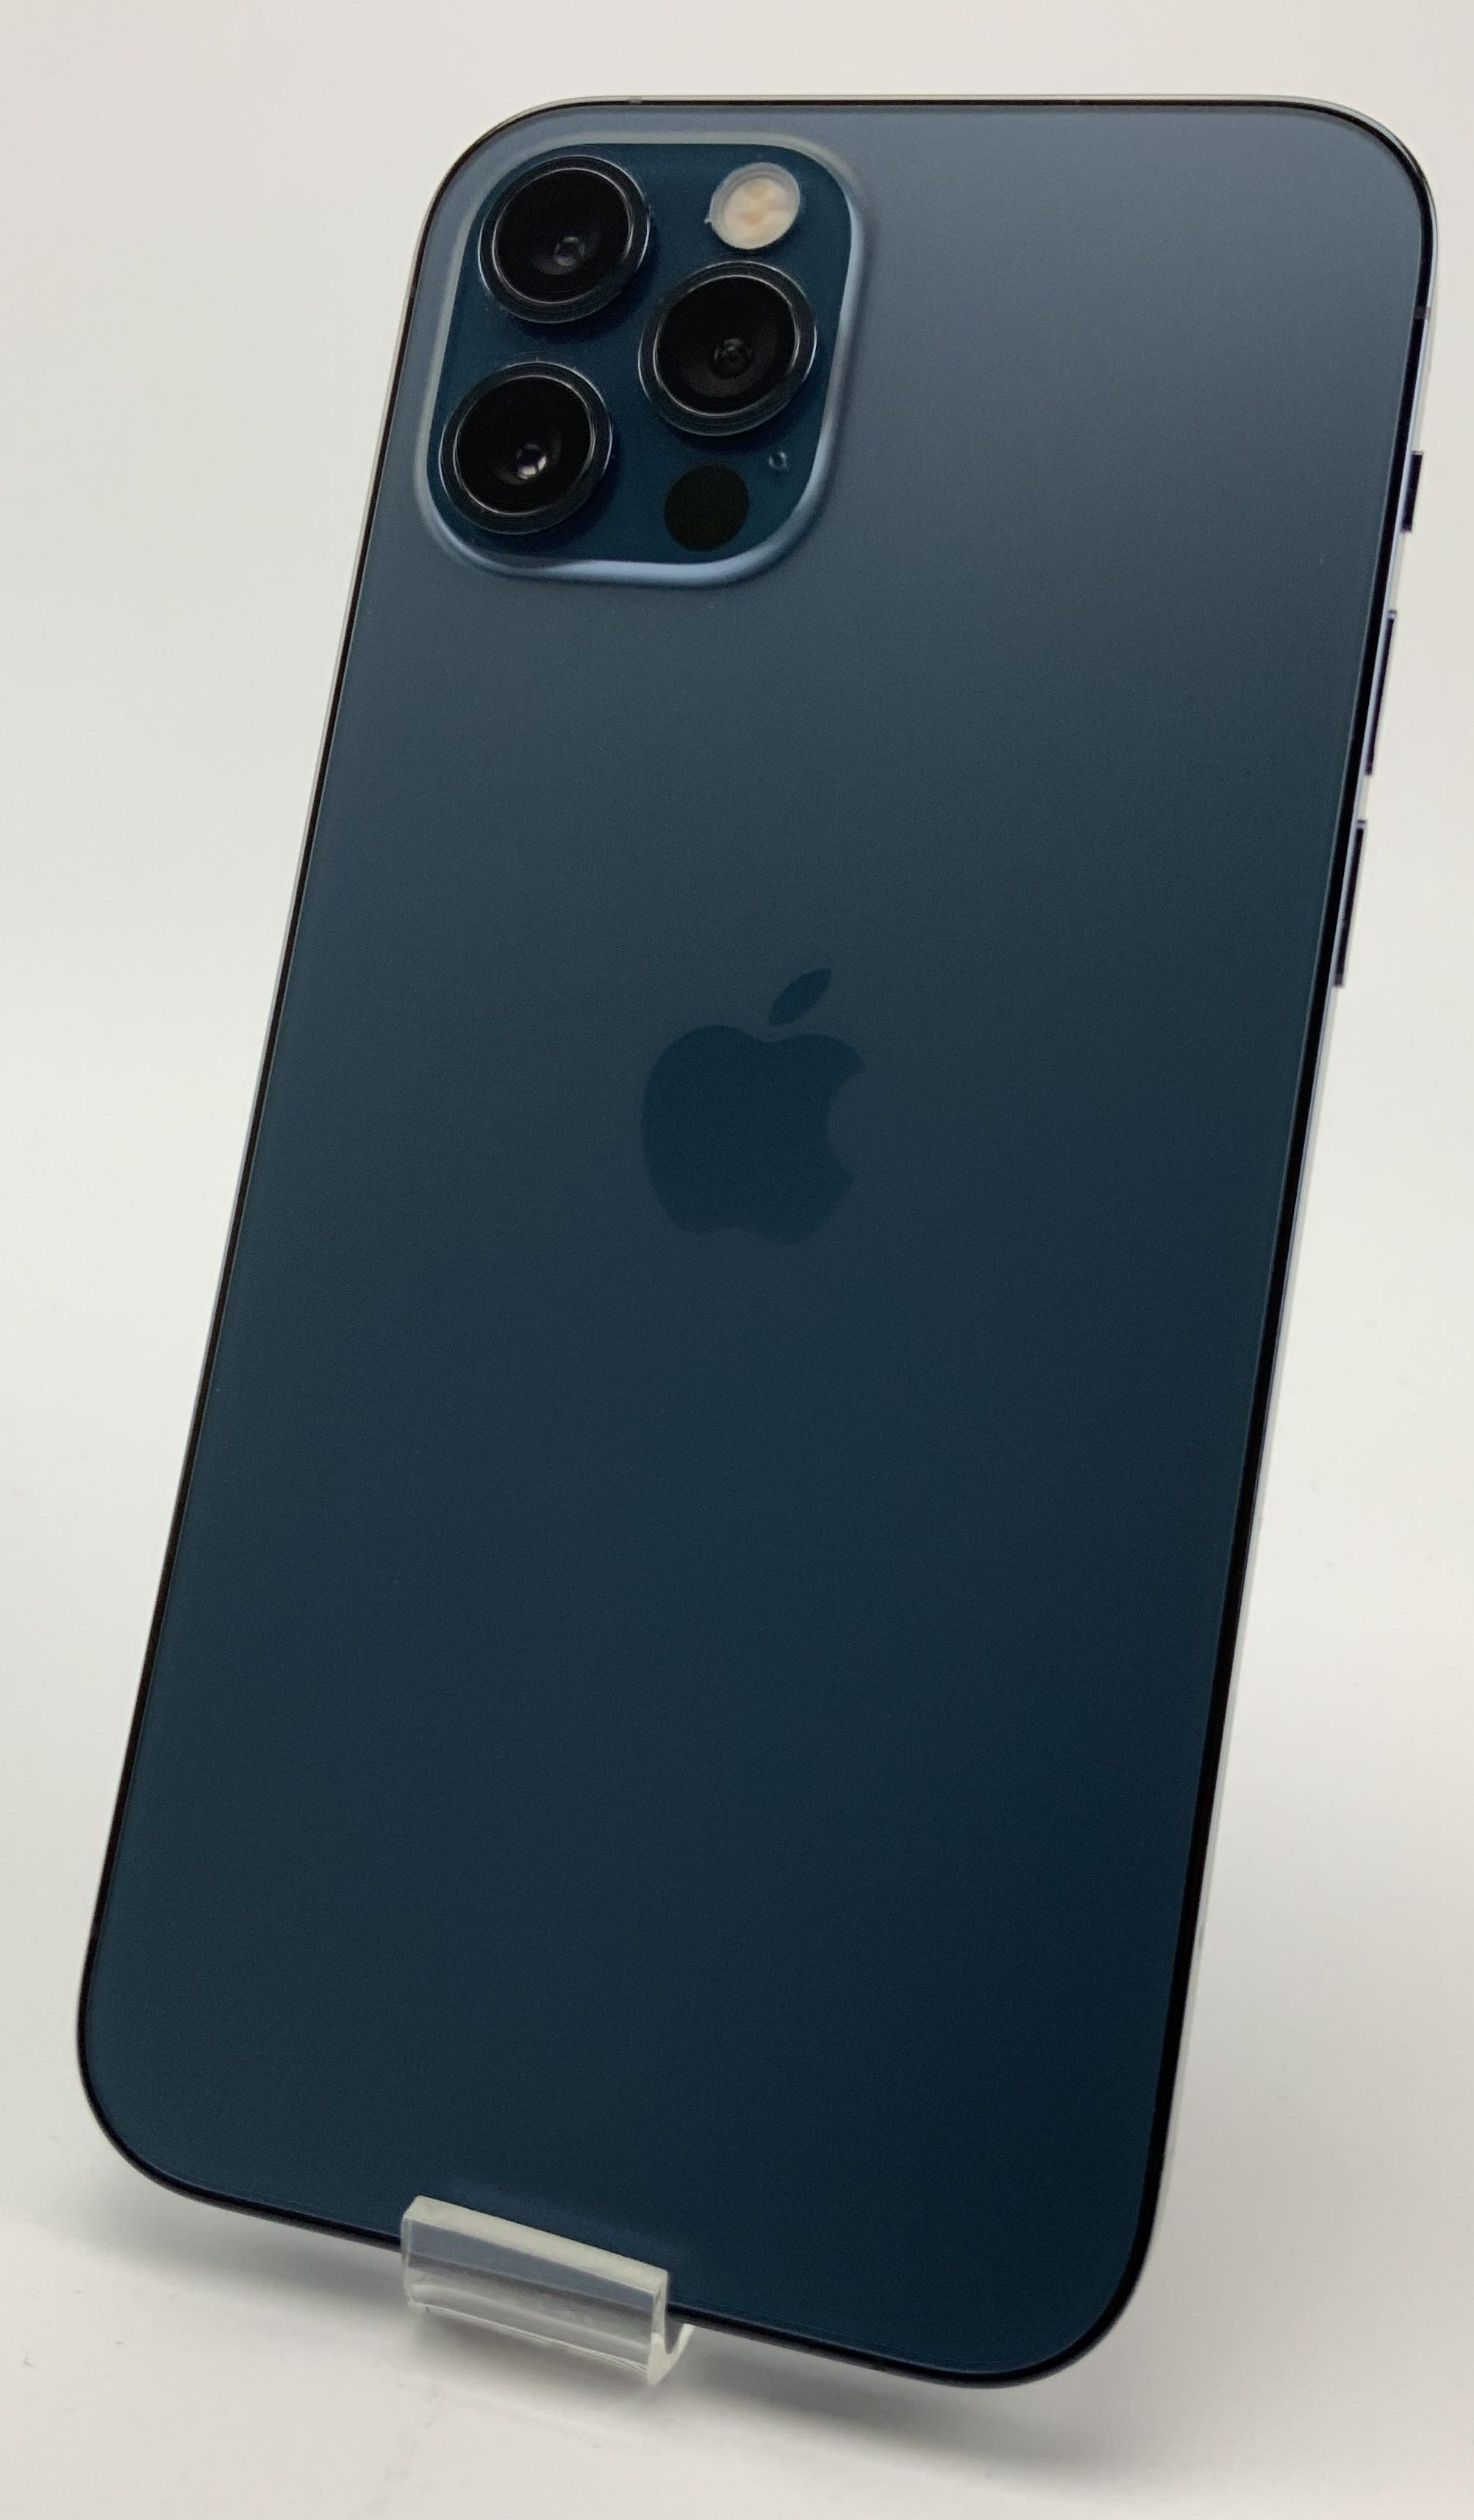 iPhone 12 Pro 256GB, 256GB, Pacific Blue, immagine 2